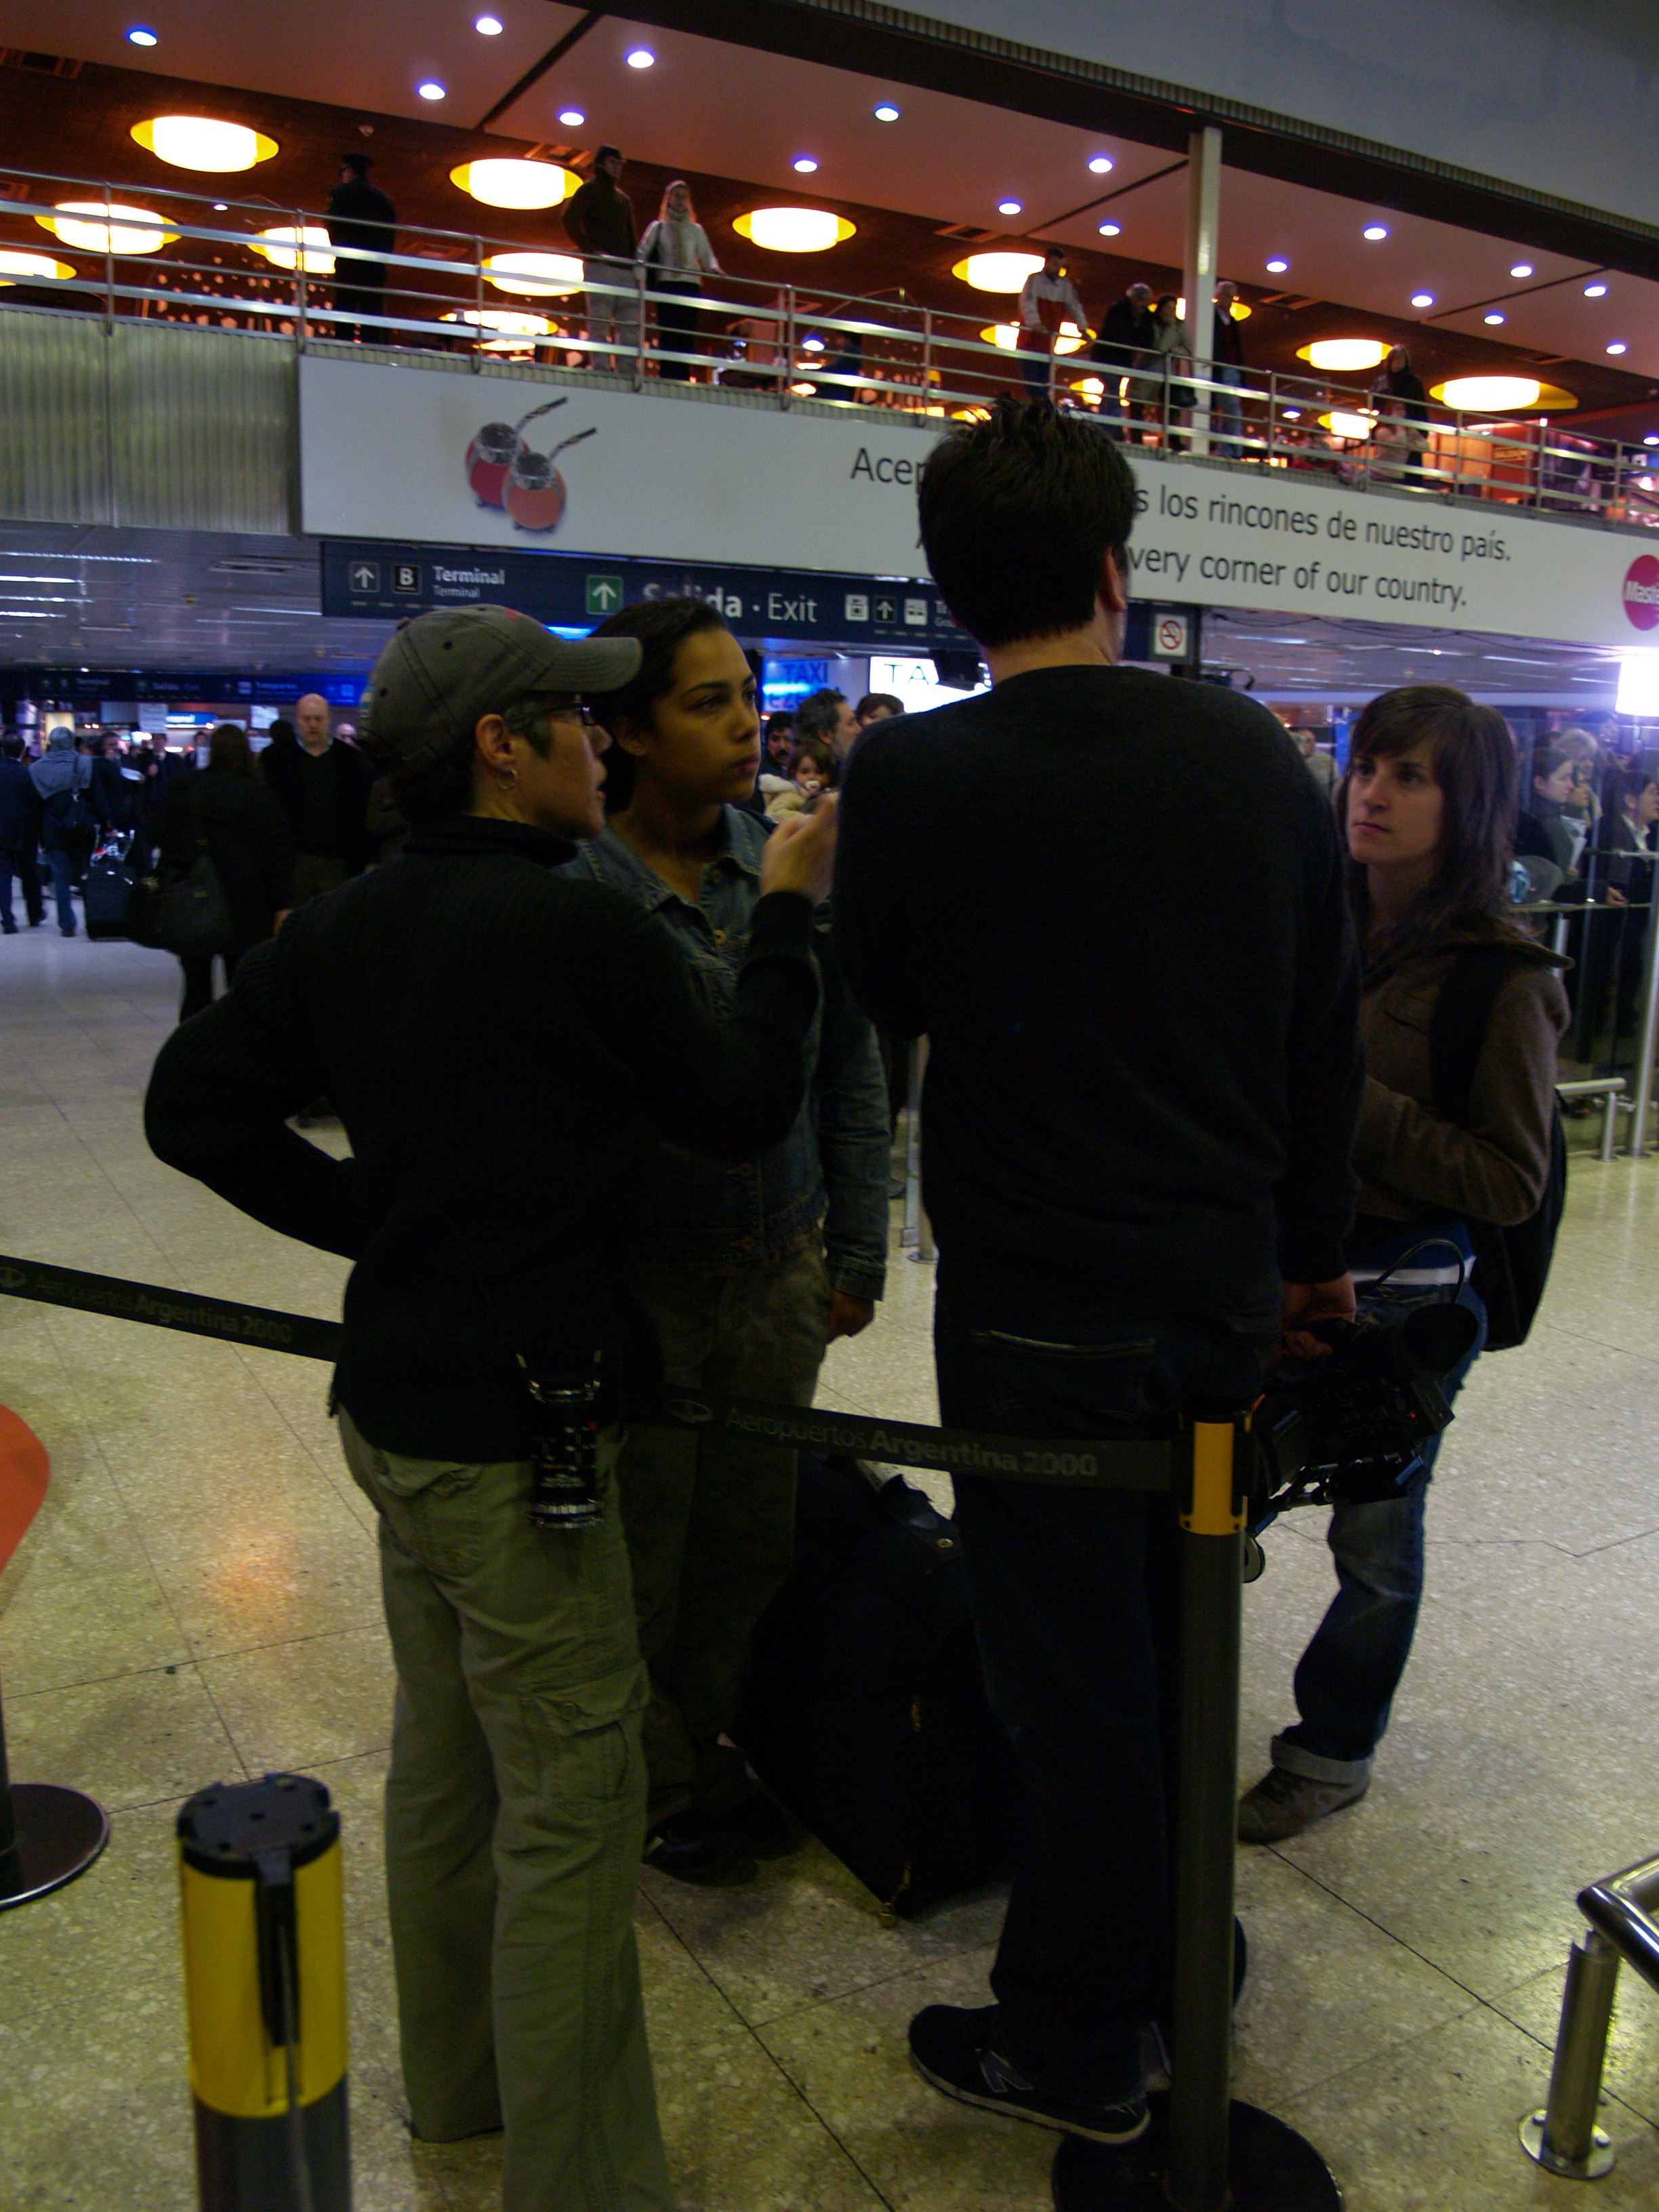 Cristina and crew filming at Ezeiza International Airport, Buenos Aires, Argentina.